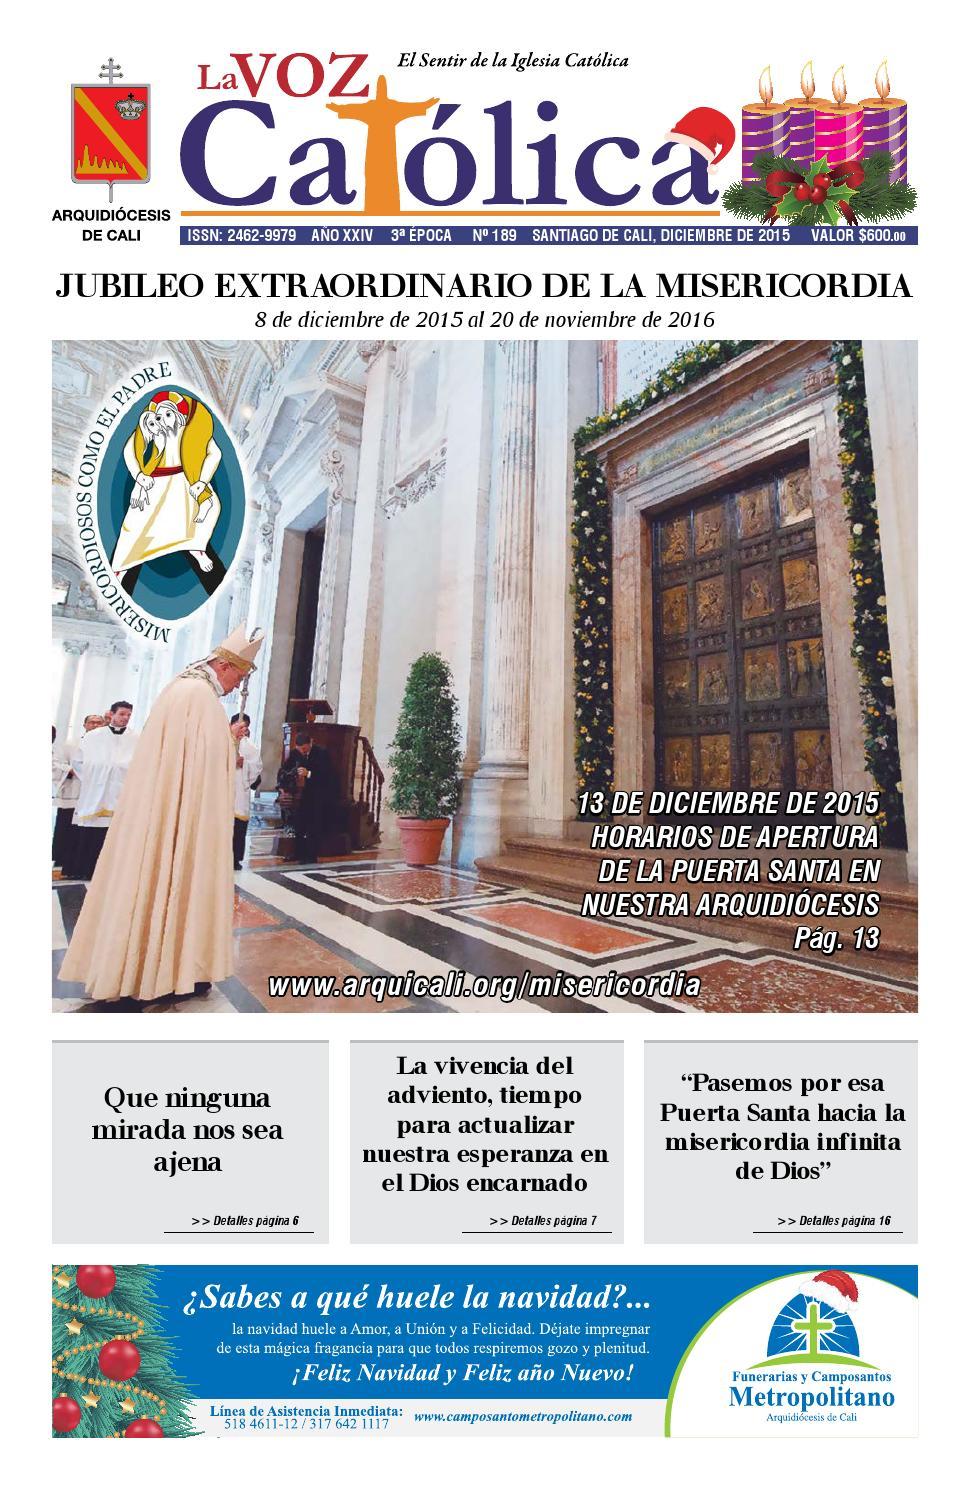 La Voz Católica Diciembre 2015 by Arquidiocesis de Cali - issuu